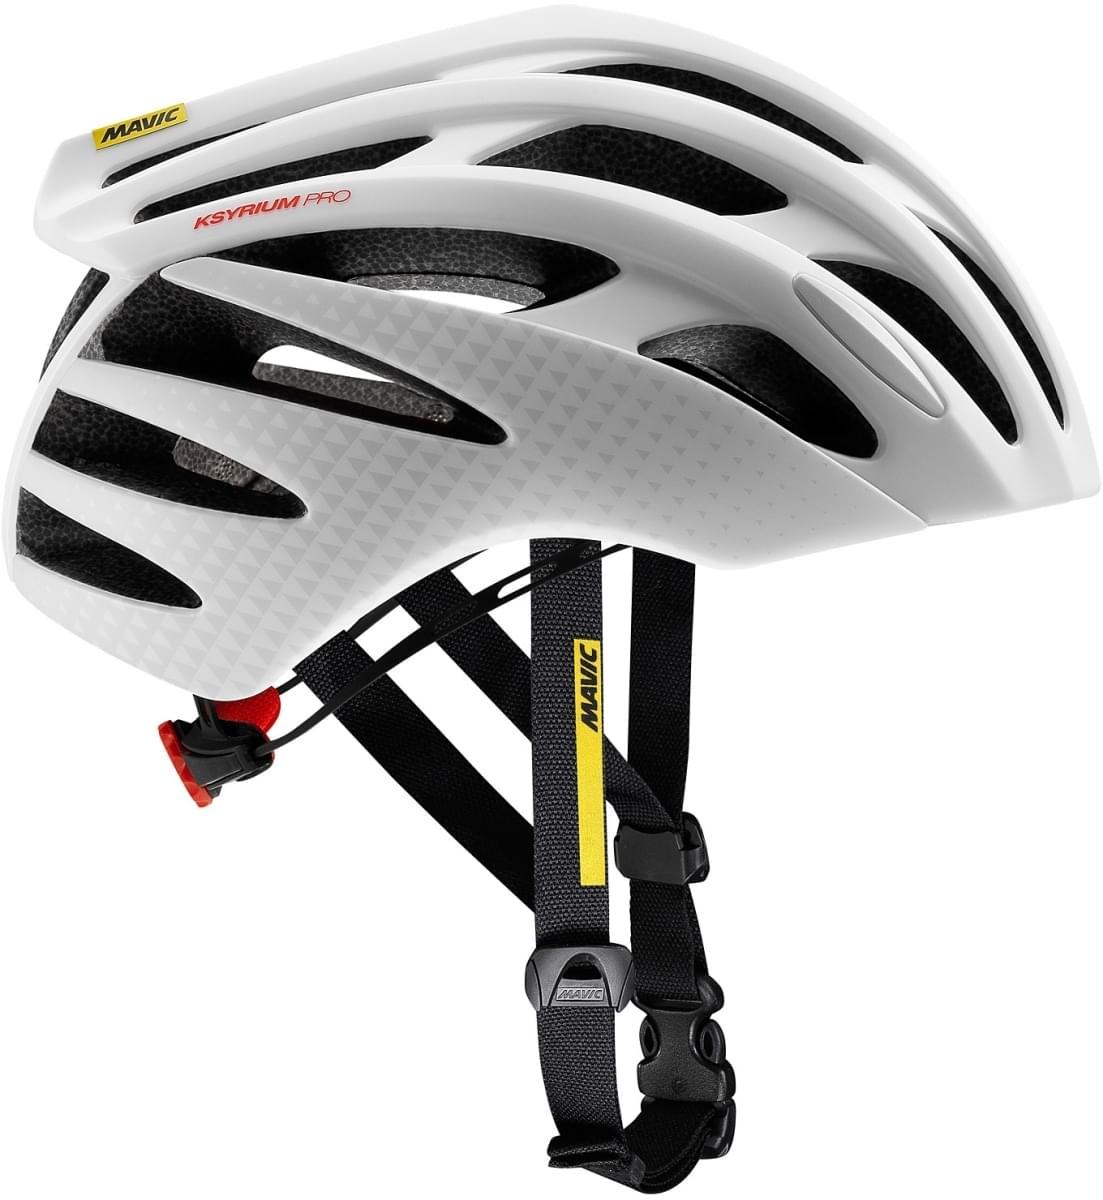 Mavic Ksyrium Pro Helmet - white/black L